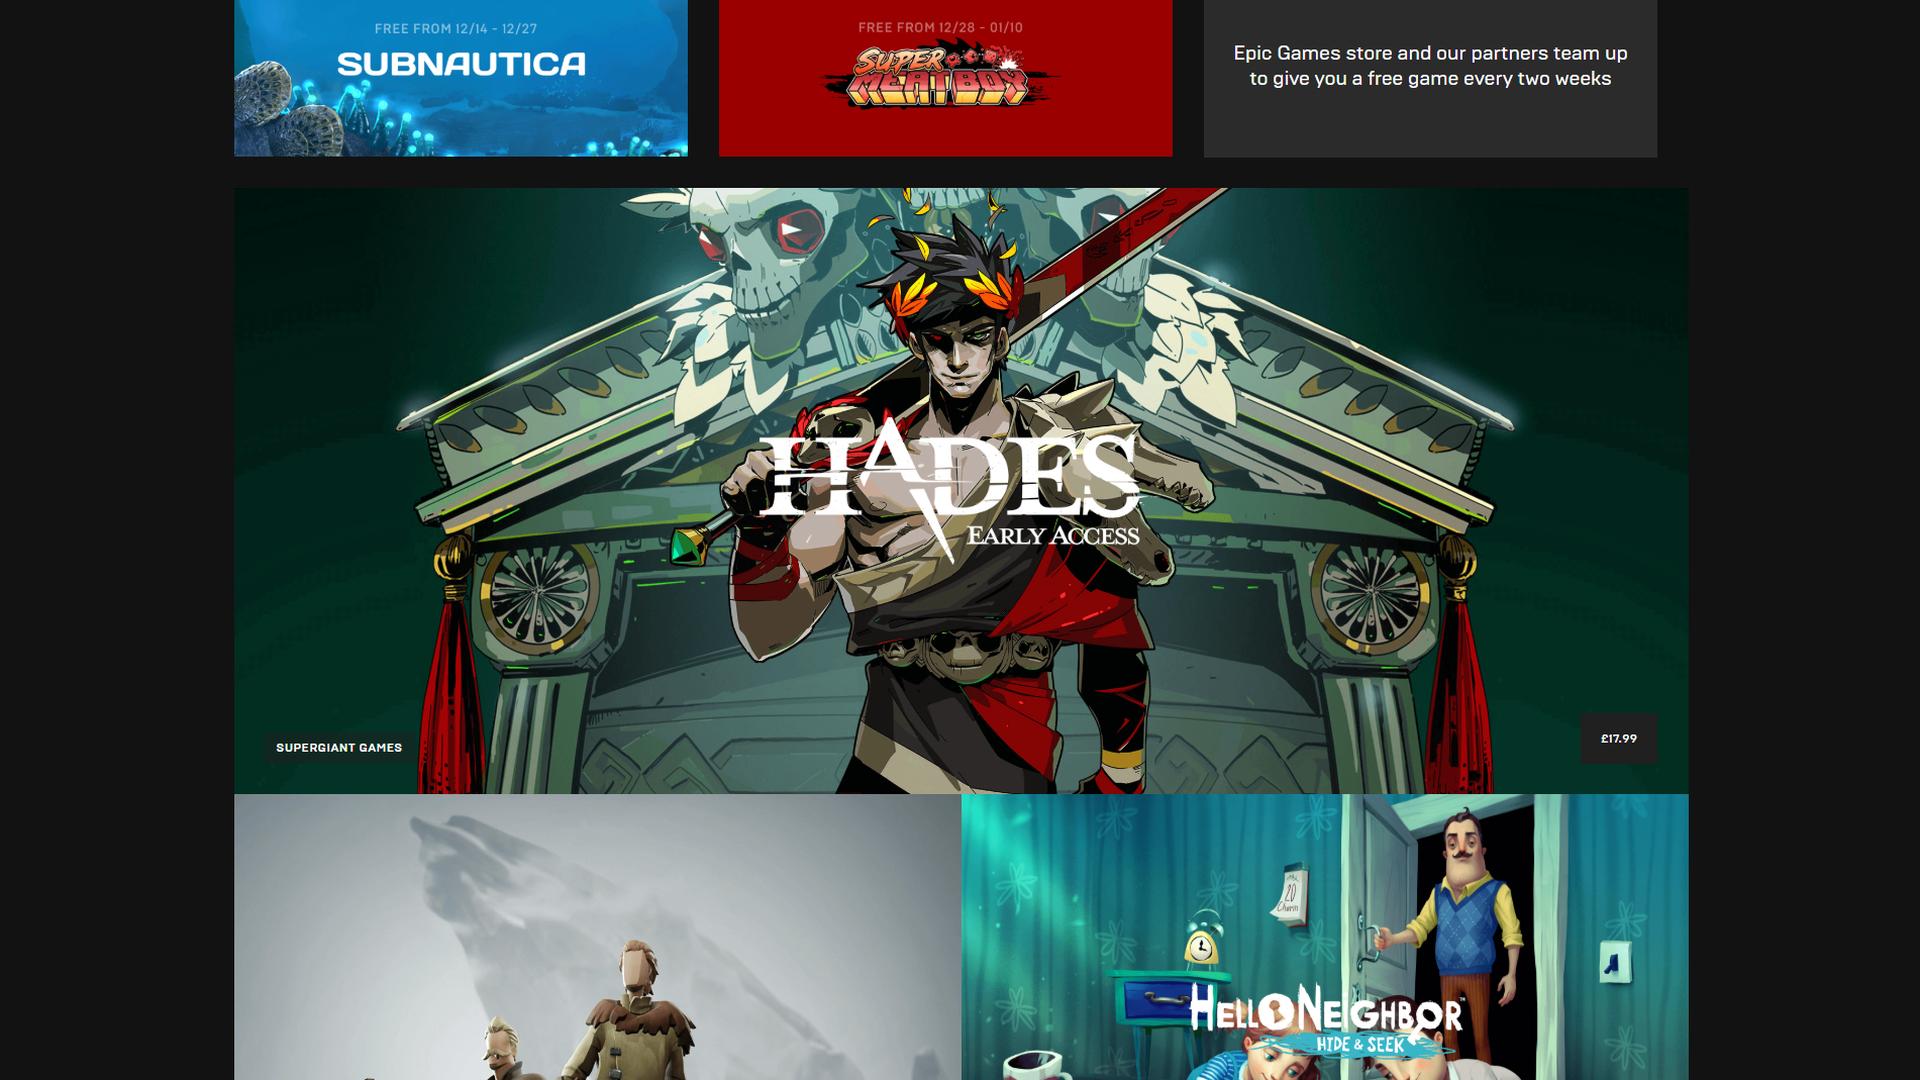 korsan oyun, epic games store